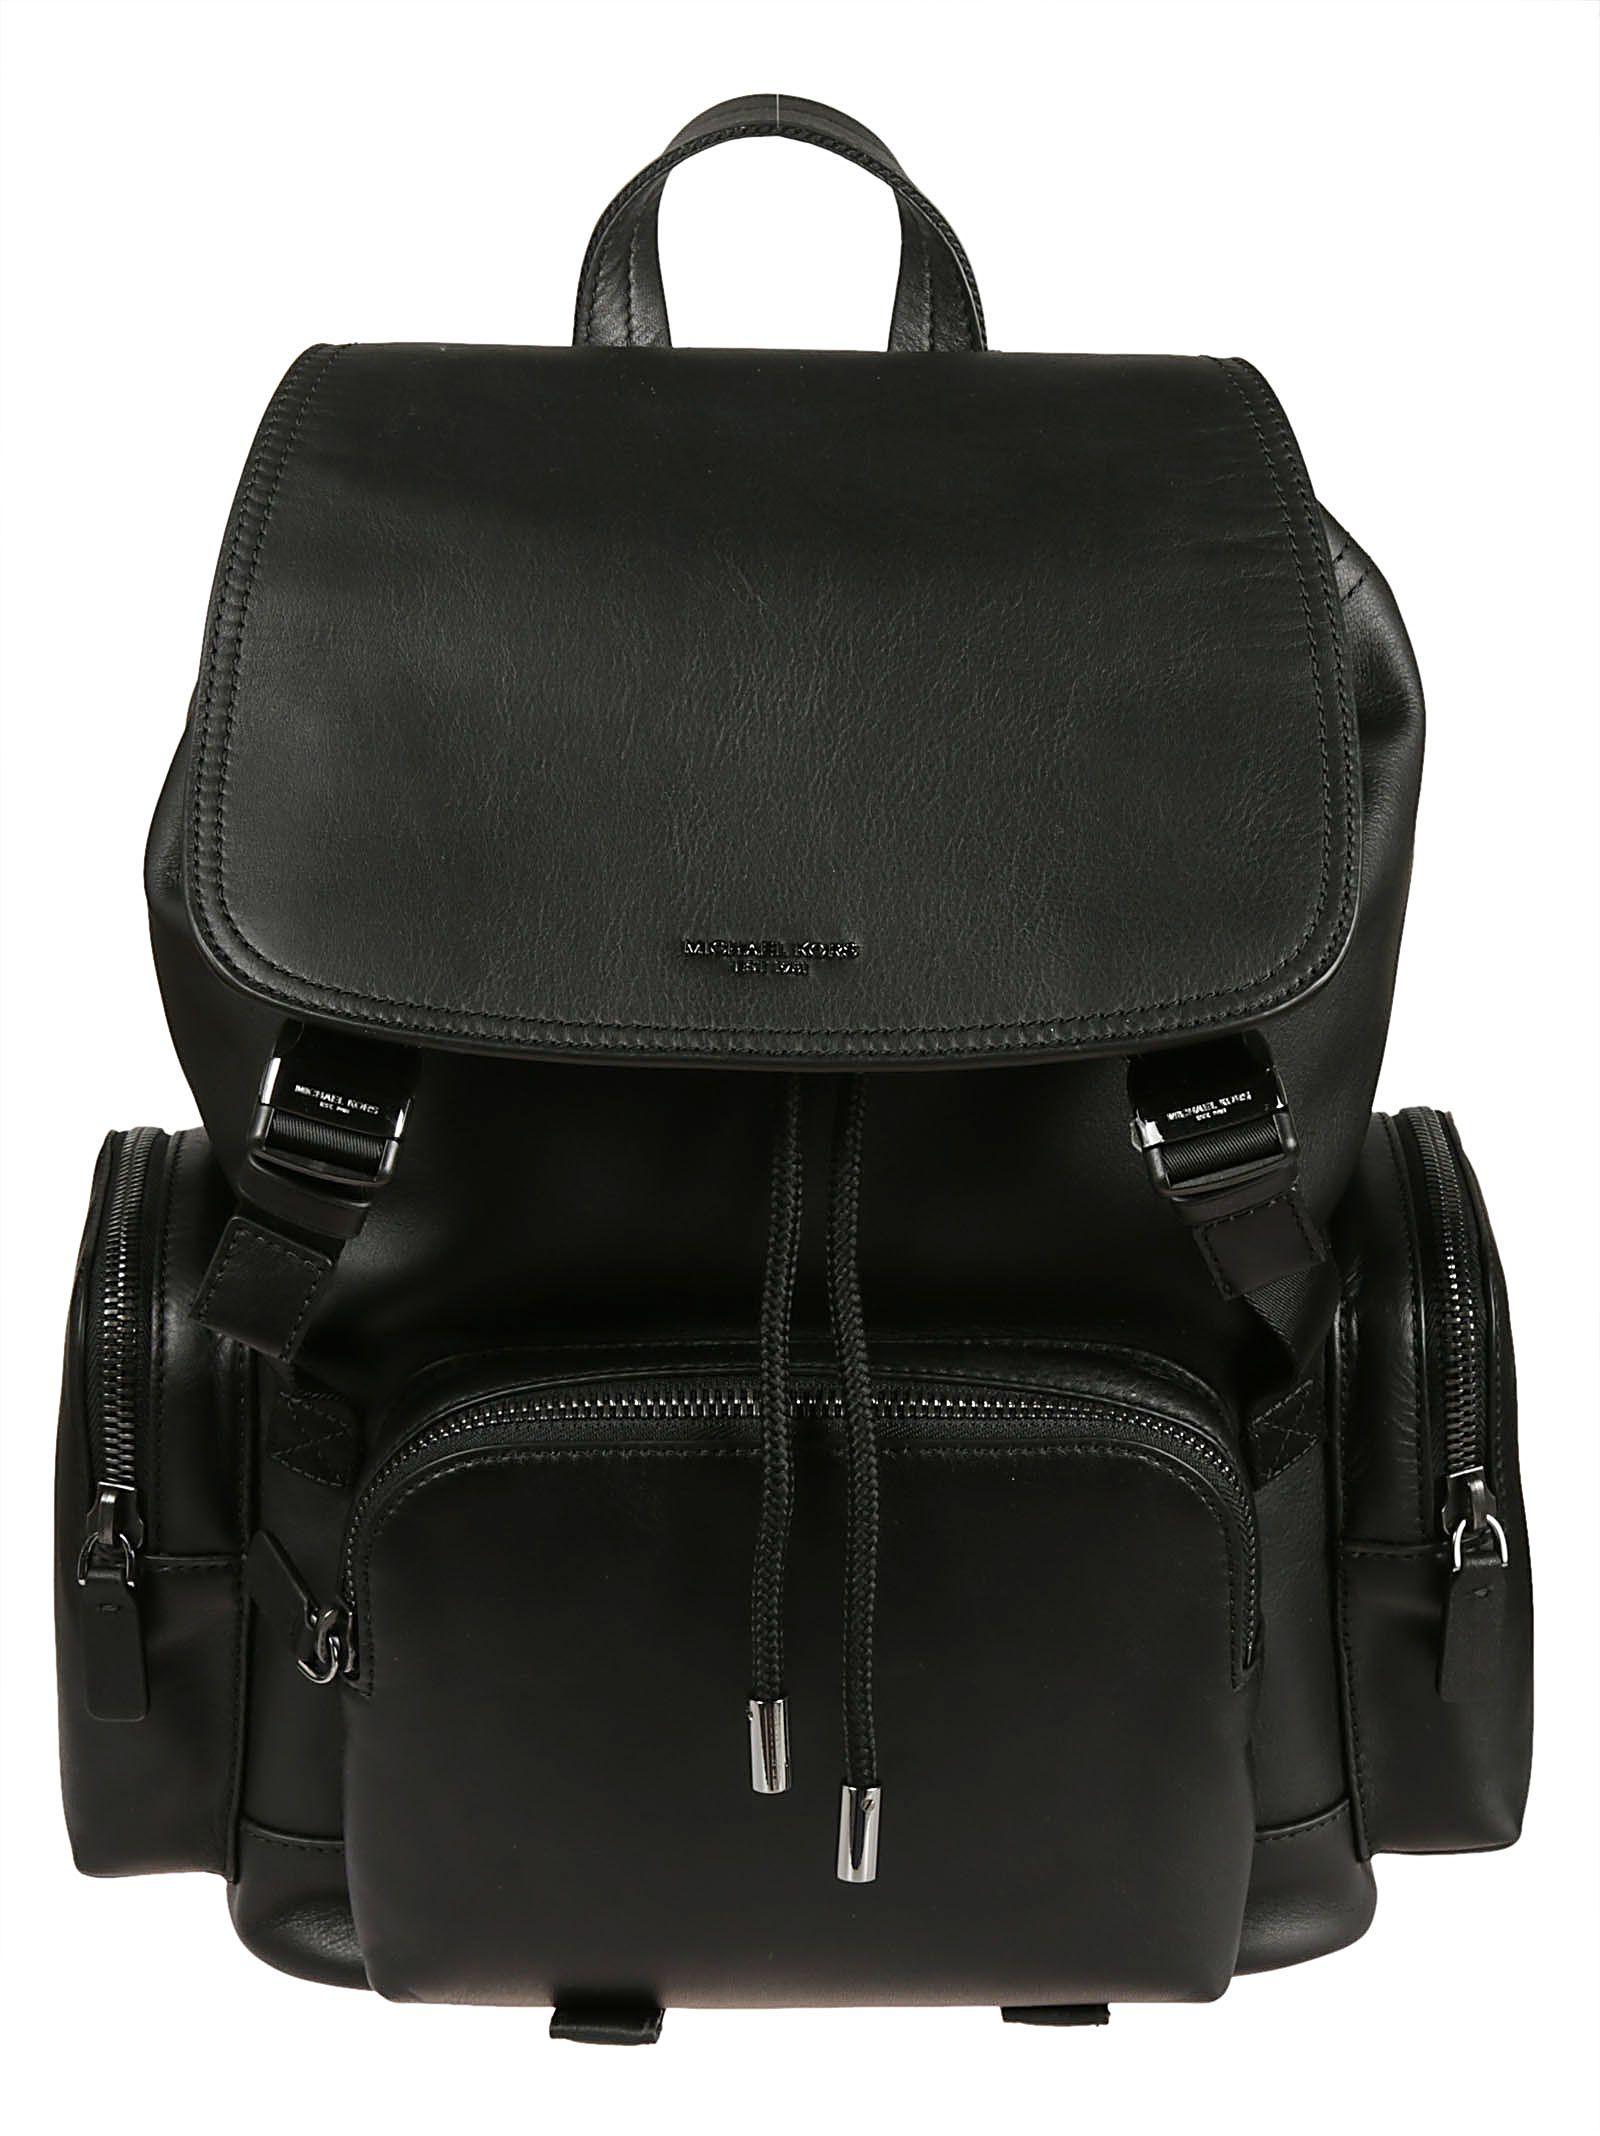 michael kors -  Spruce Backpack